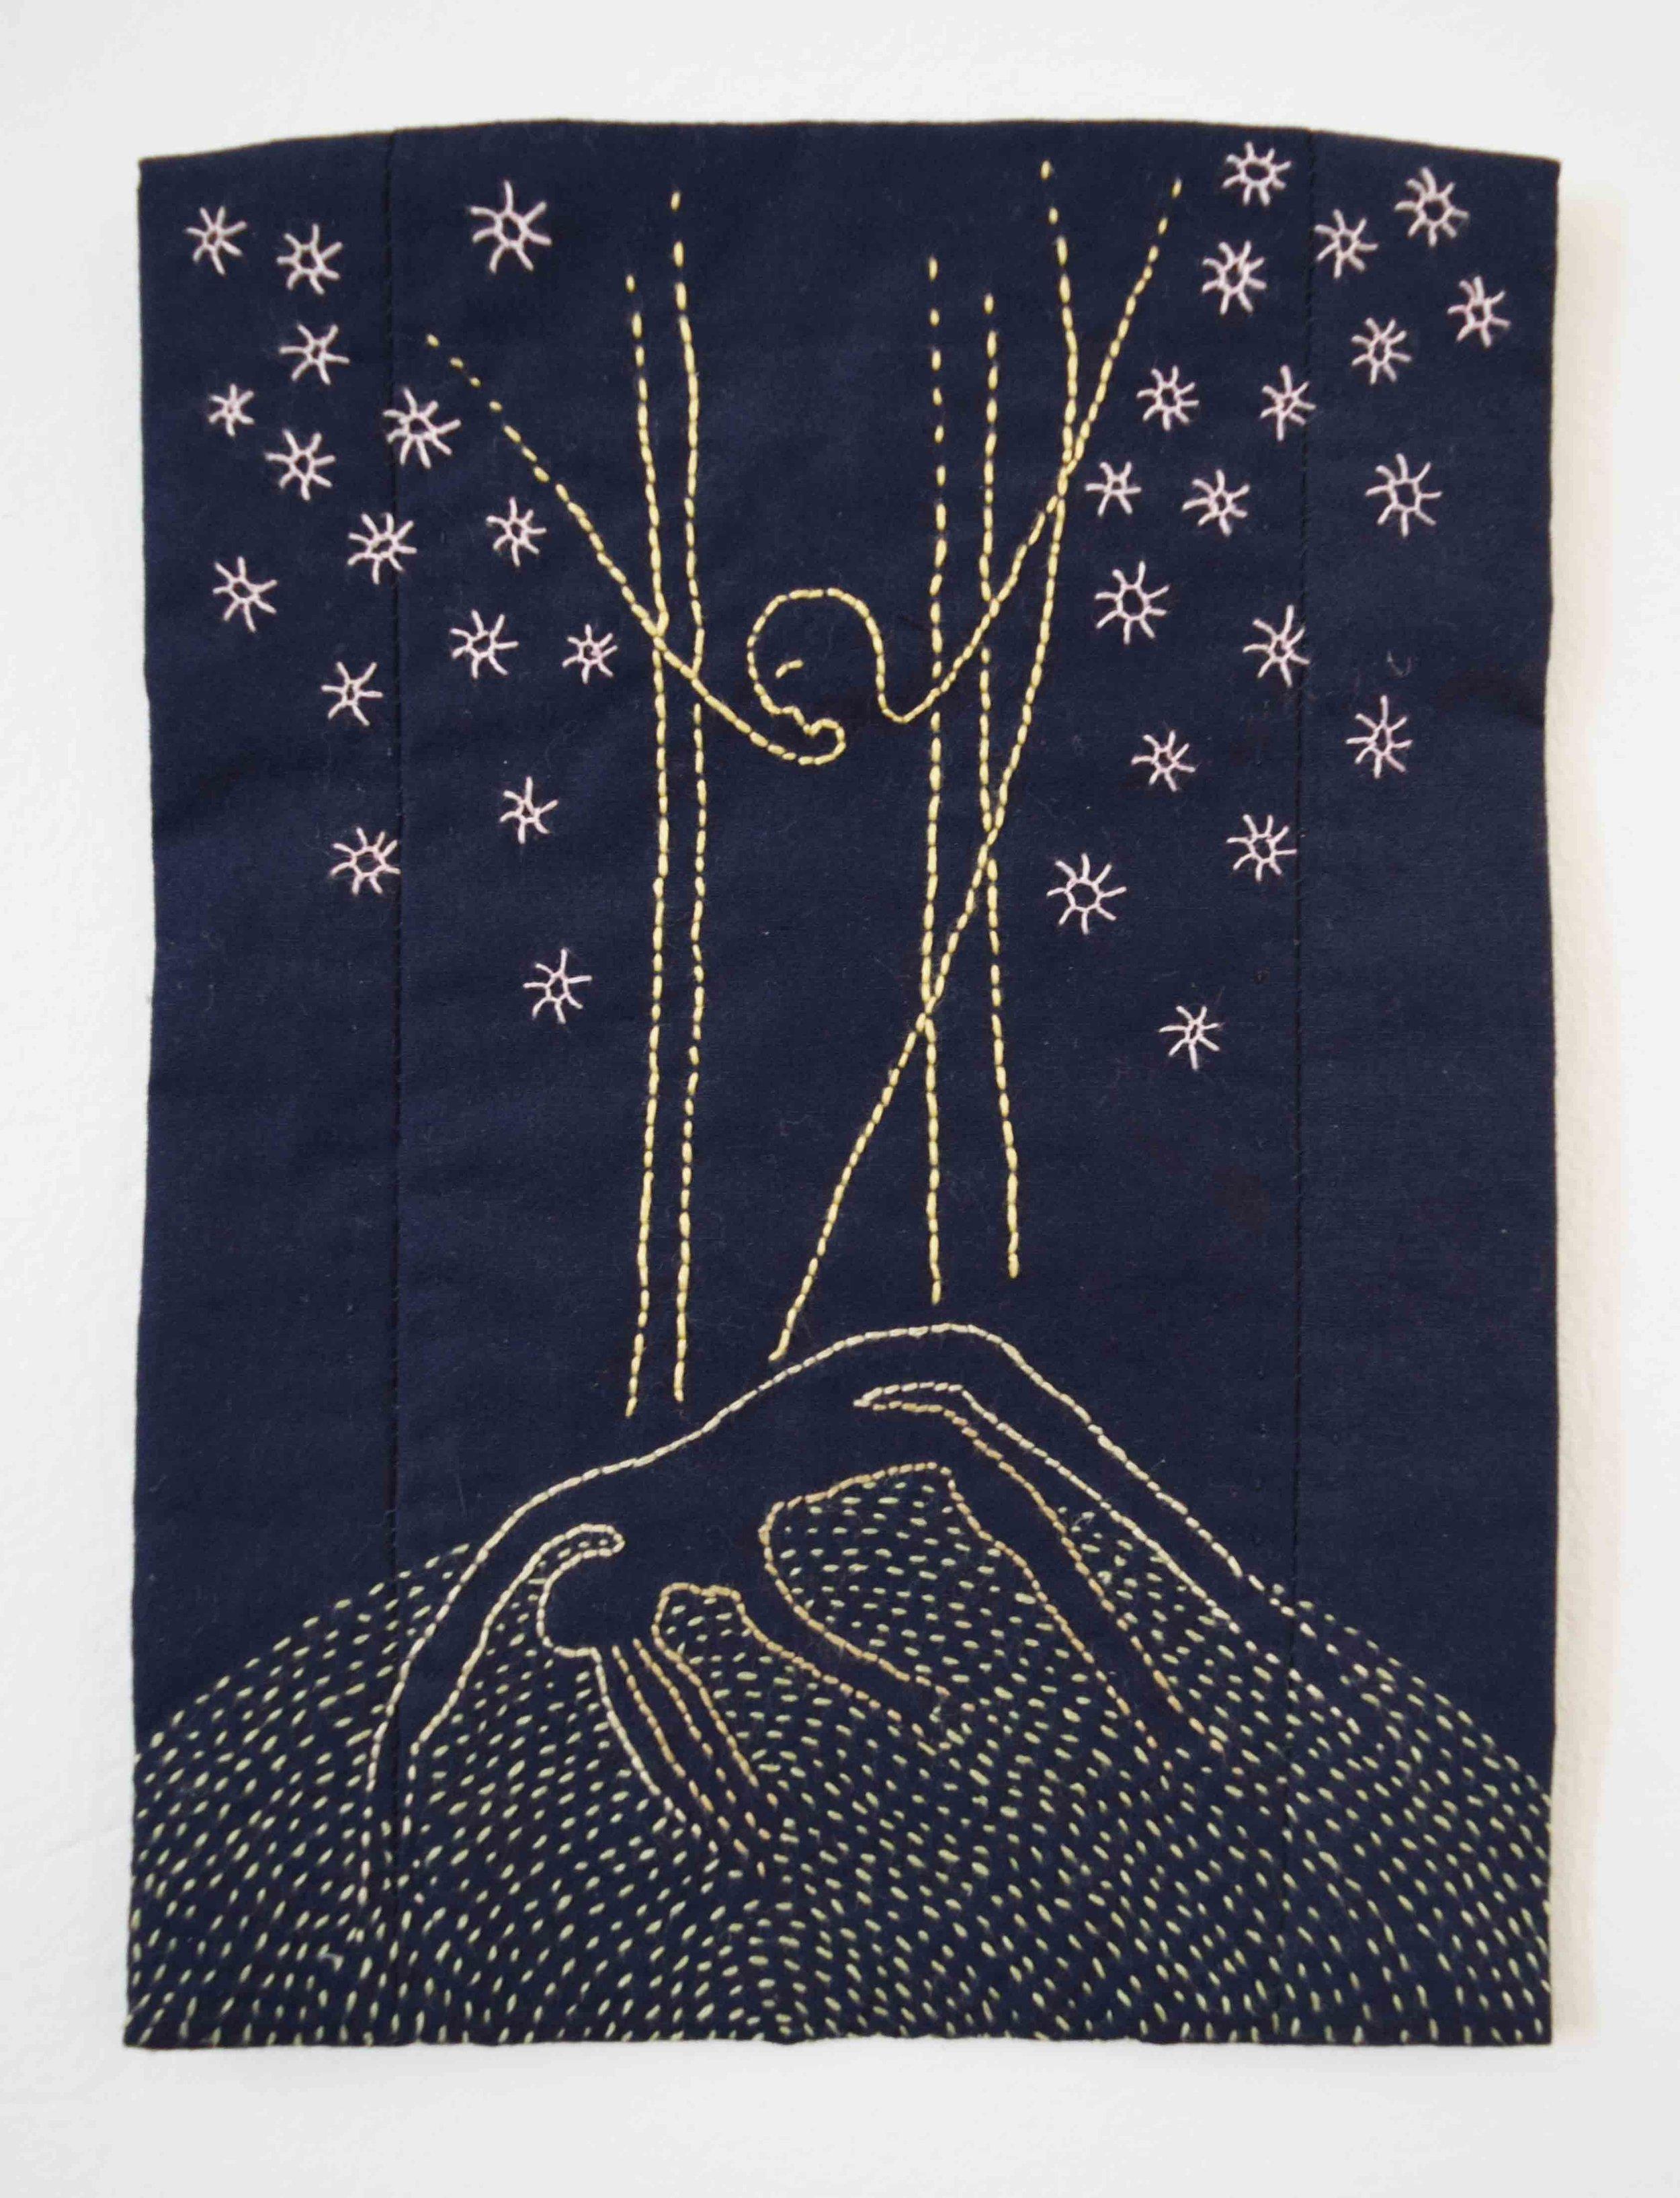 29. Anne Williams,  Metamorphosis,  2018, hand stitched cotton, 21 x 16 cm $125